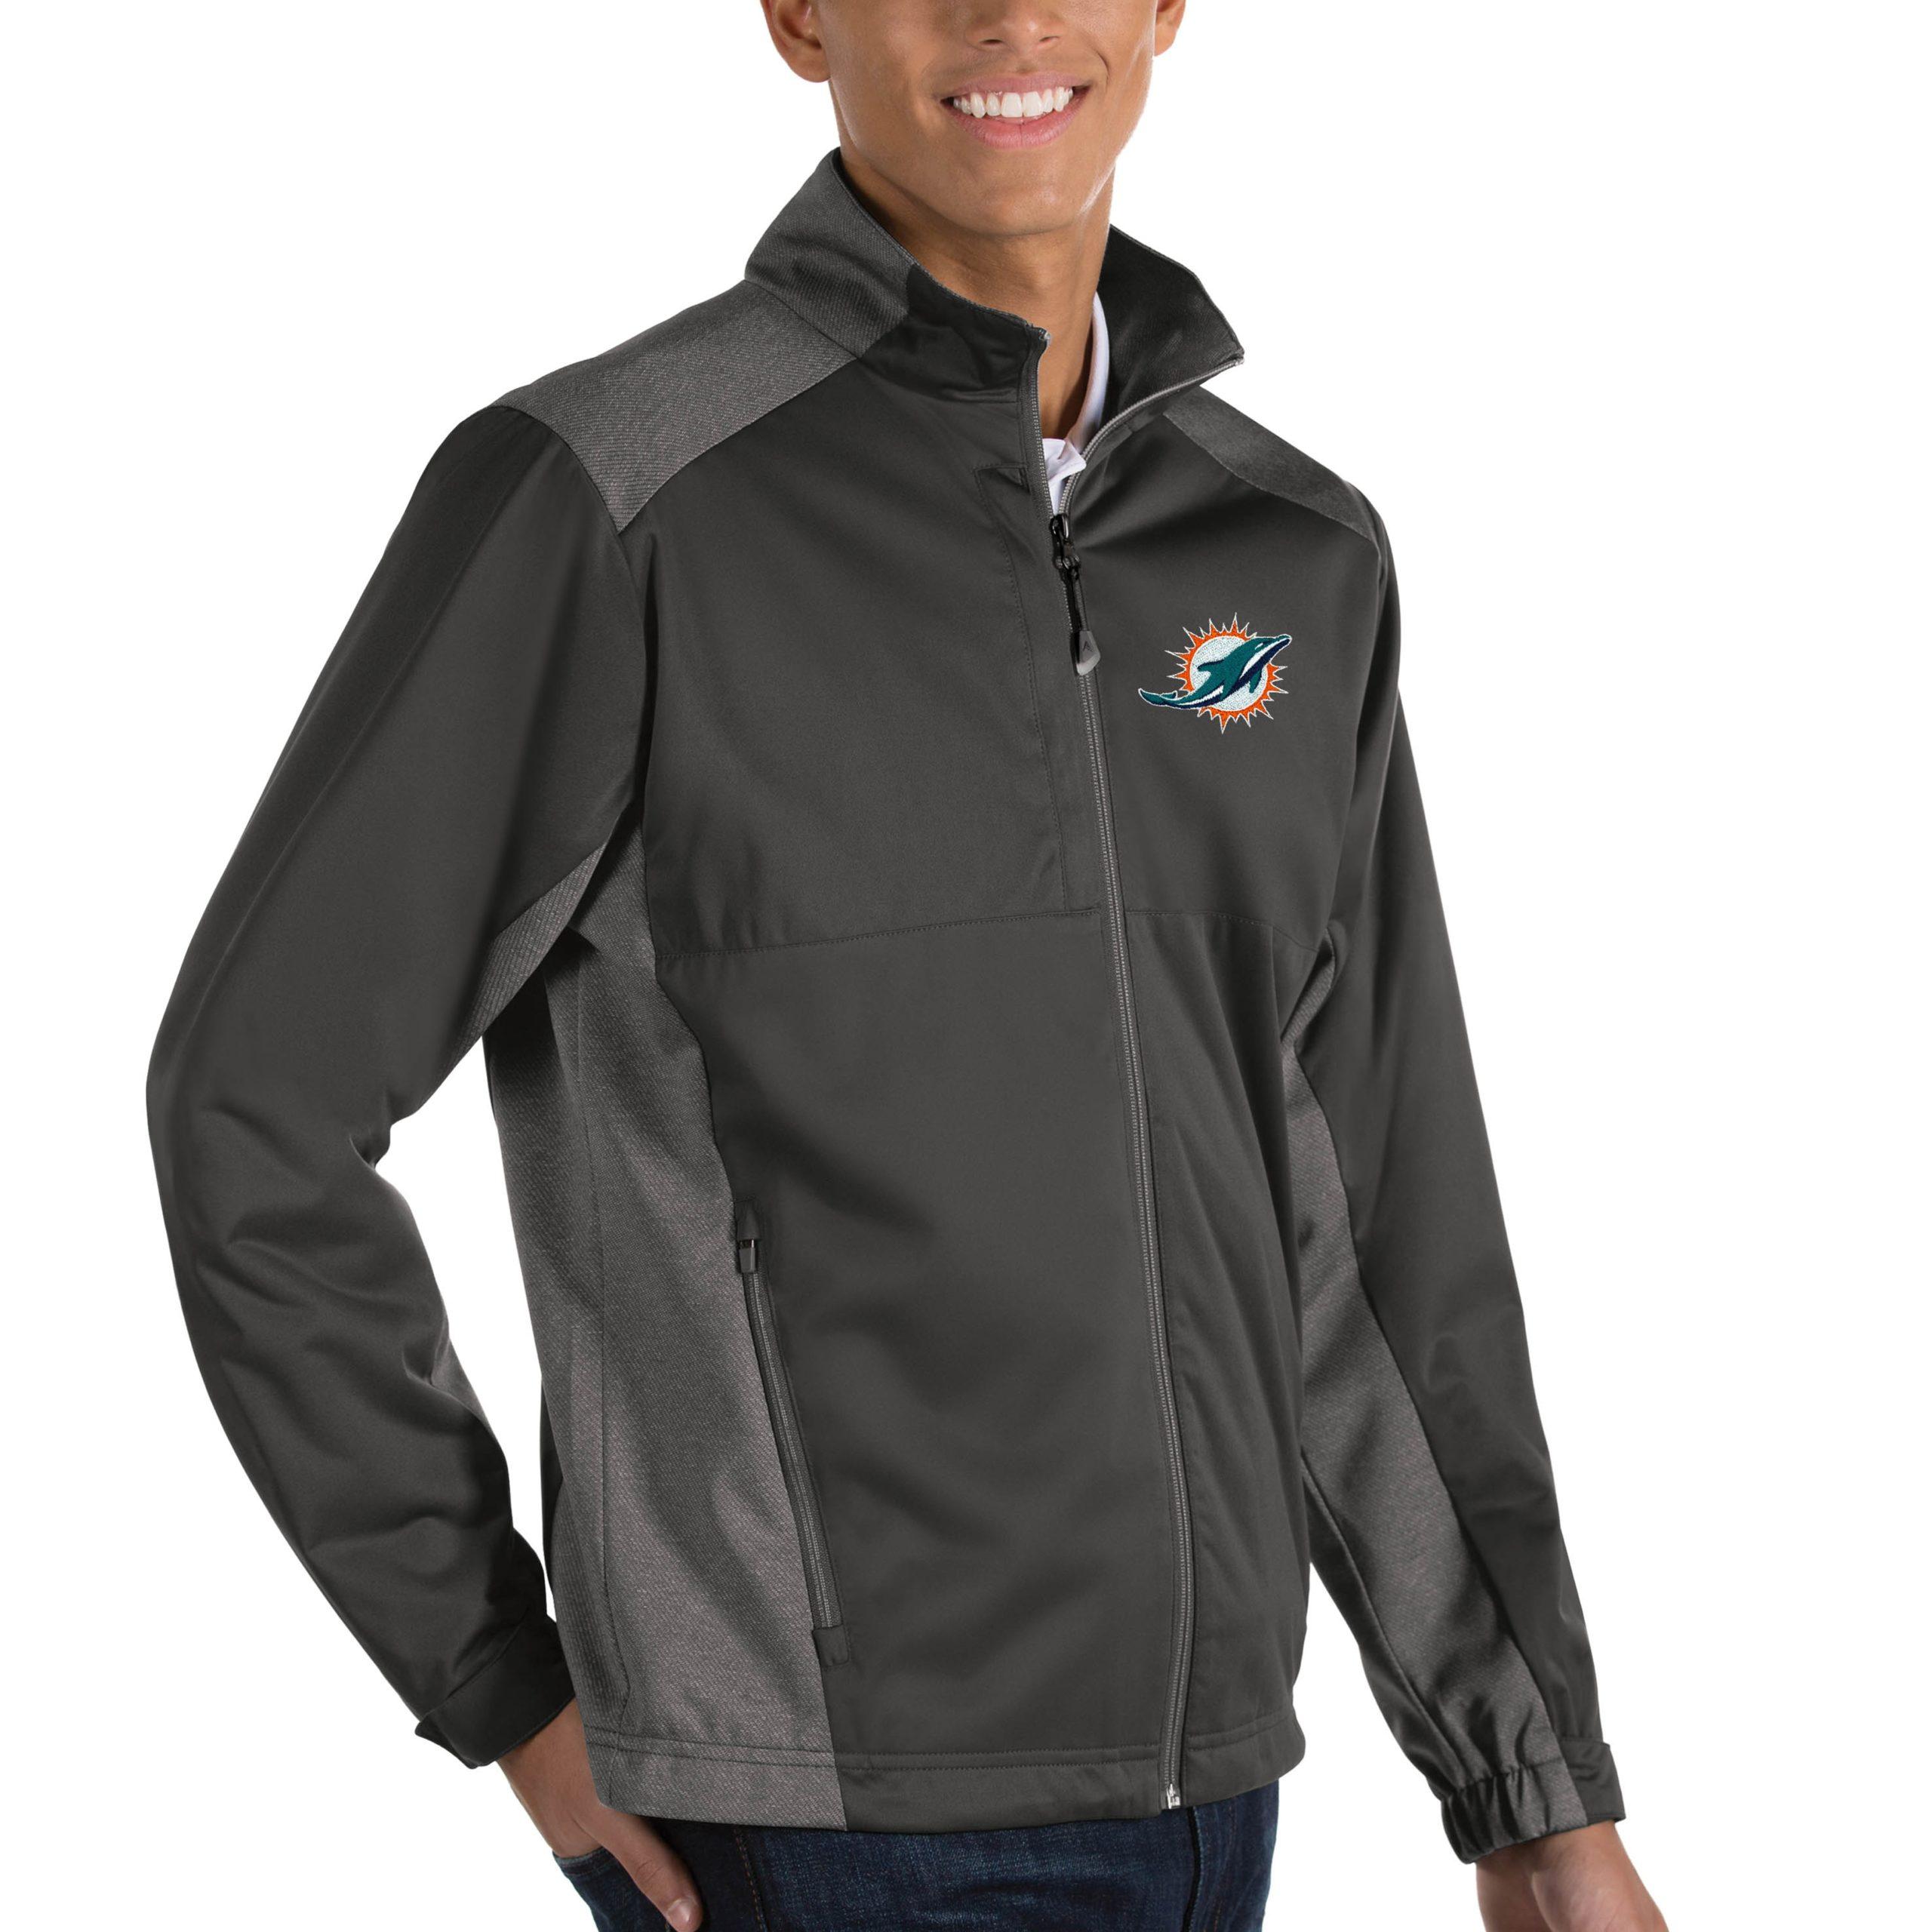 Miami Dolphins Antigua Revolve Big & Tall Full-Zip Jacket - Heather Charcoal